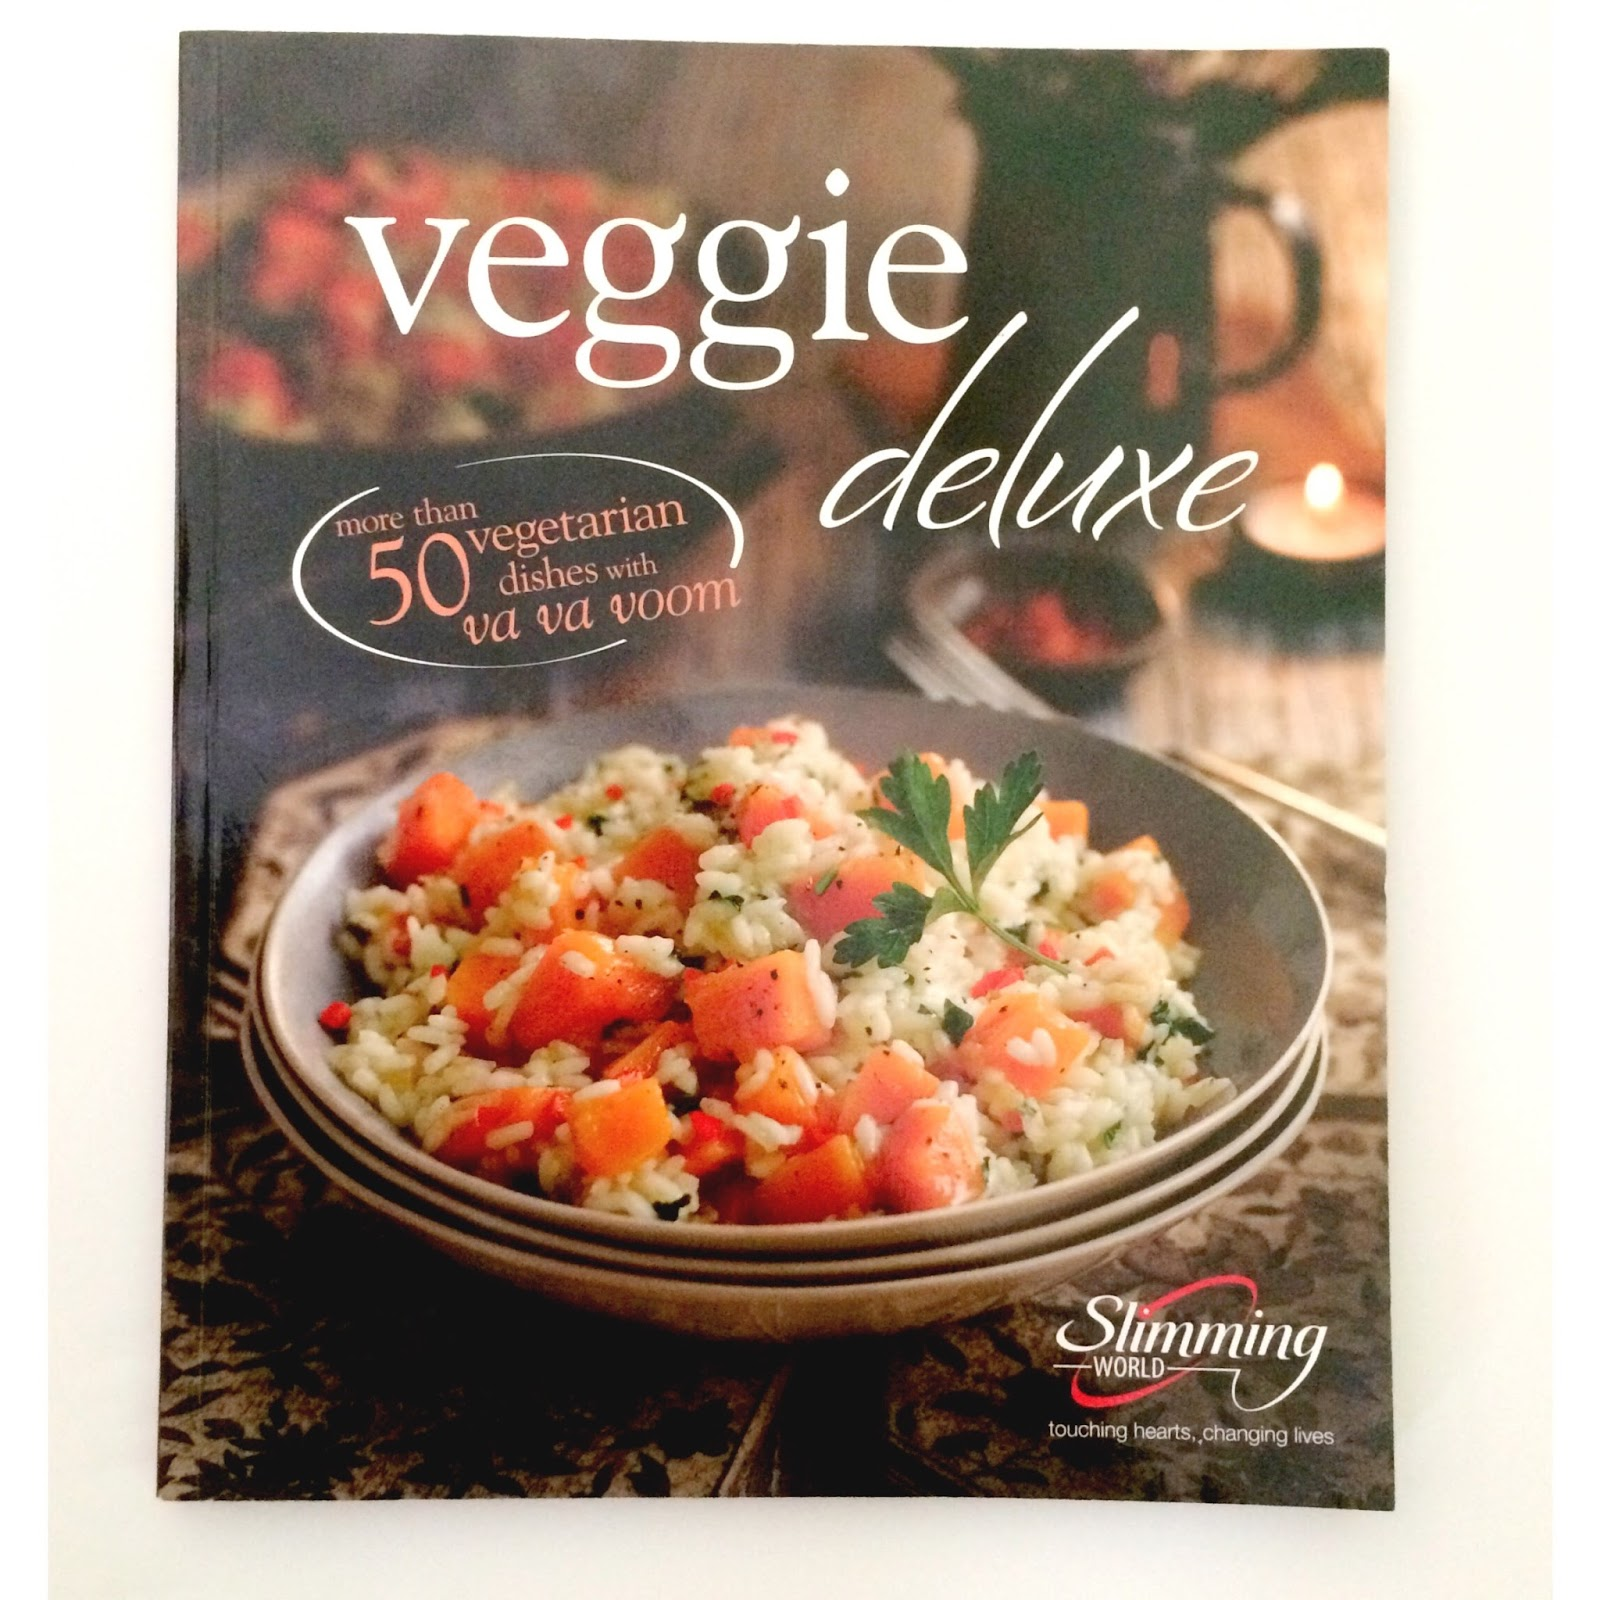 Slimming world veggie deluxe recipe book review newcastle family life slimming world veggie deluxe book forumfinder Choice Image